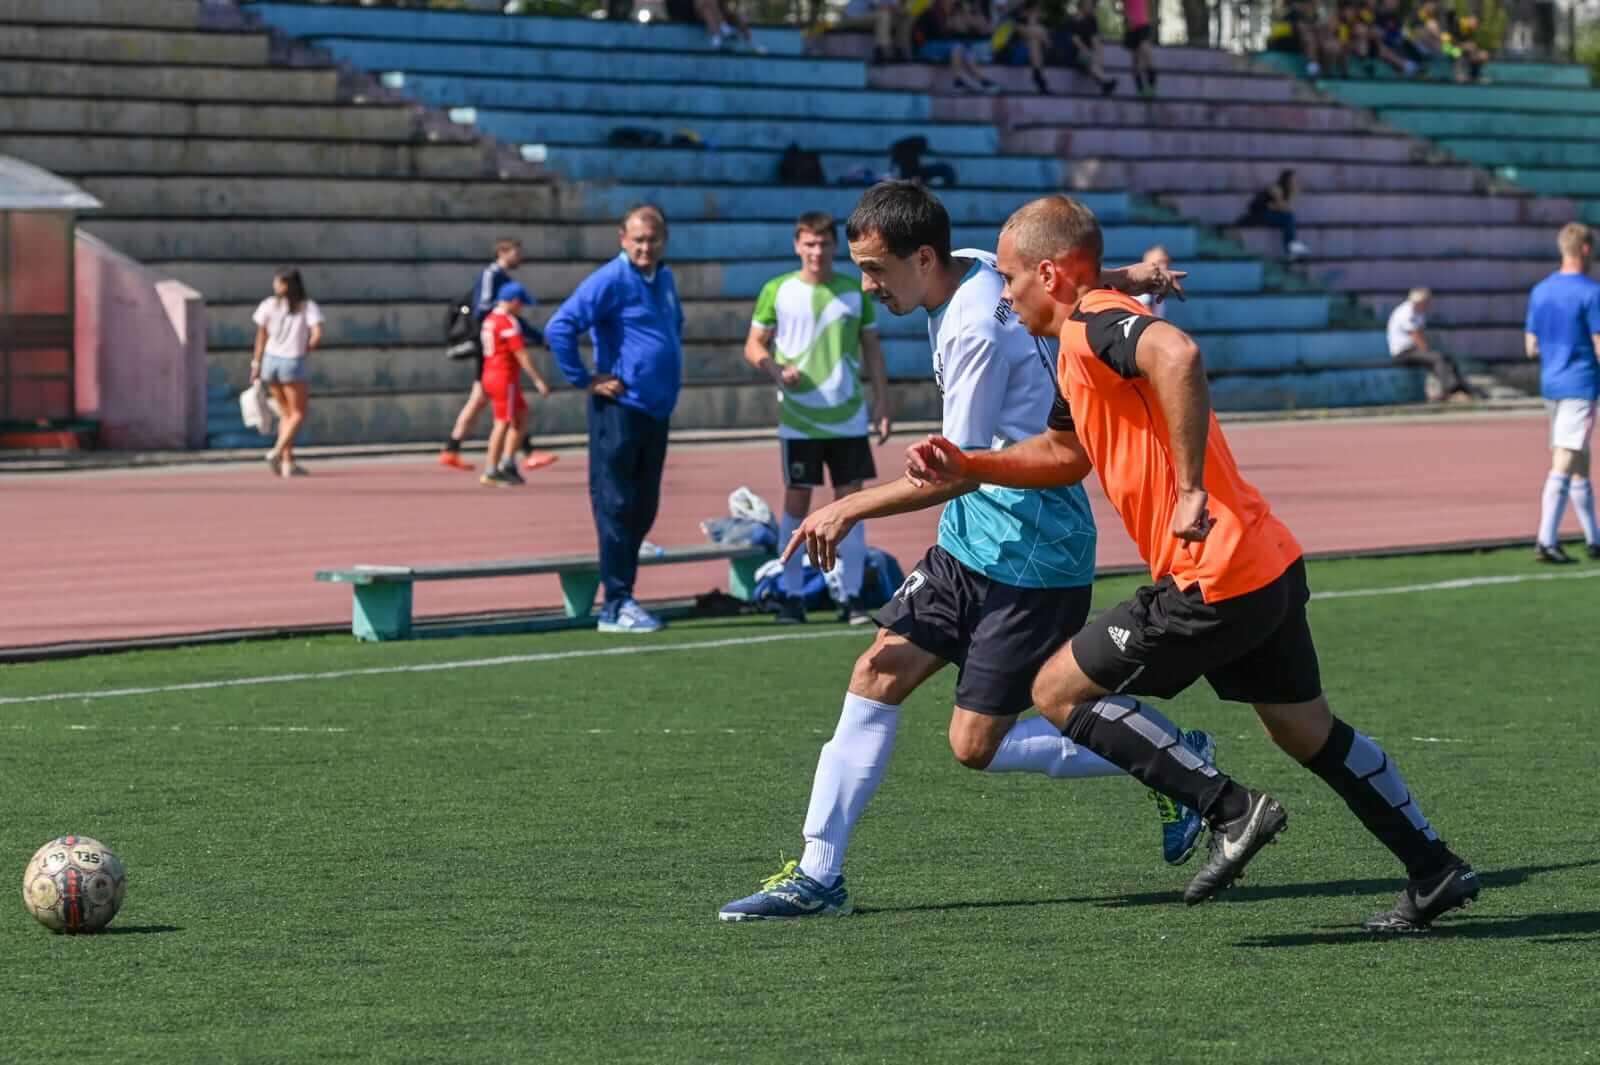 В Иркутске 10 сентября стартует XXXII турнир по мини-футболу памяти Л.П. Перминова